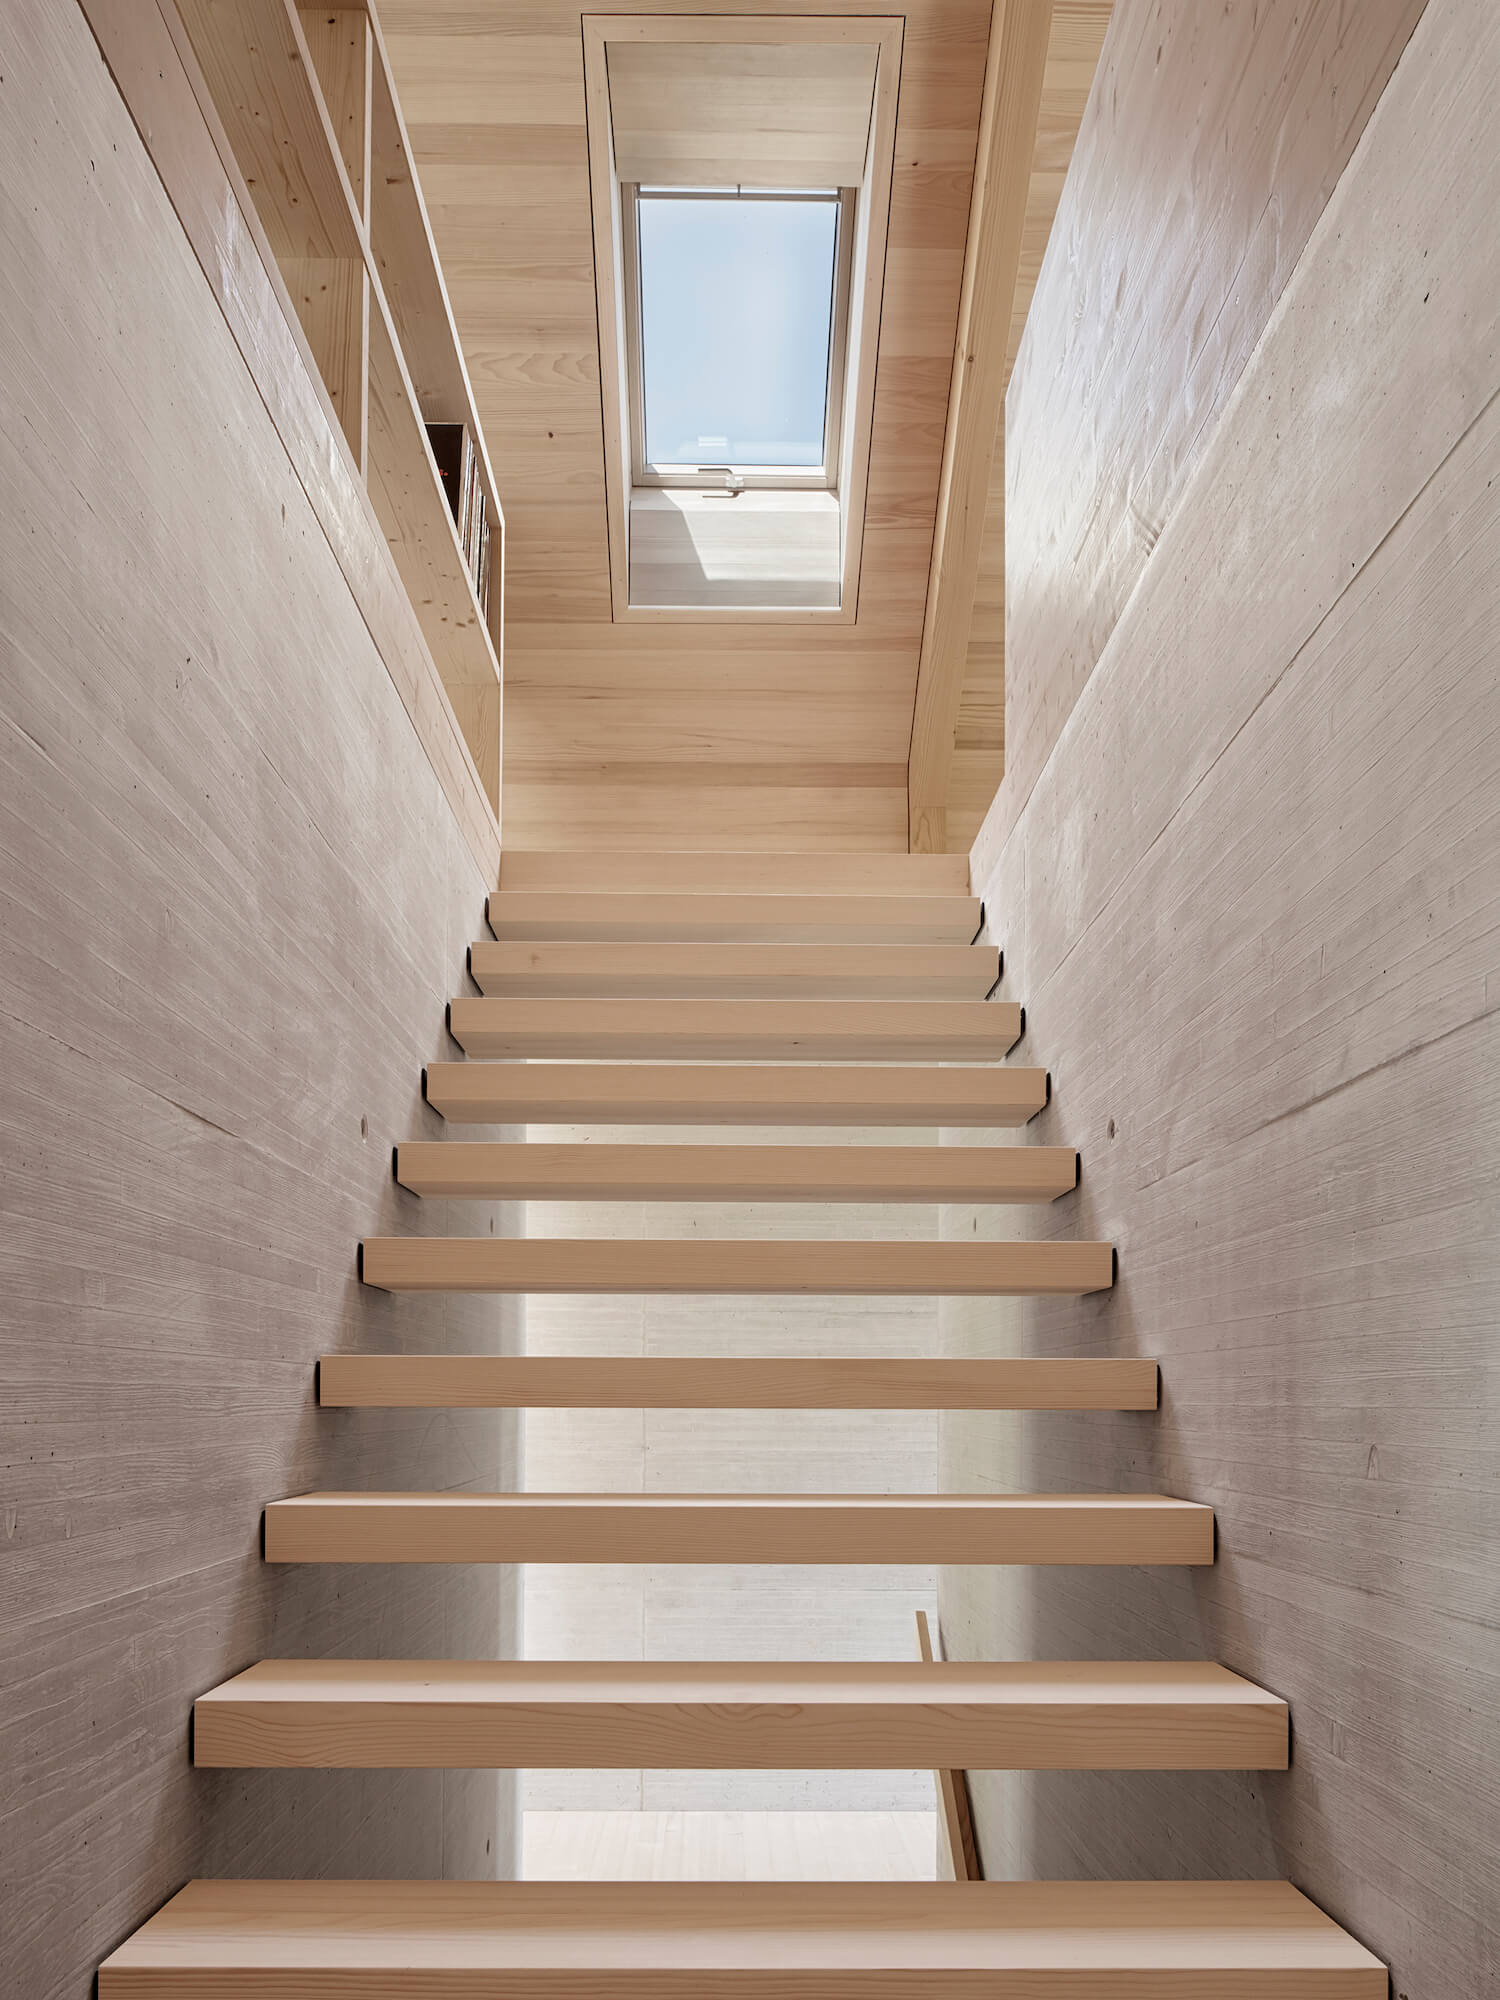 est living minimalist timber homes house hoeller IMA 6 1